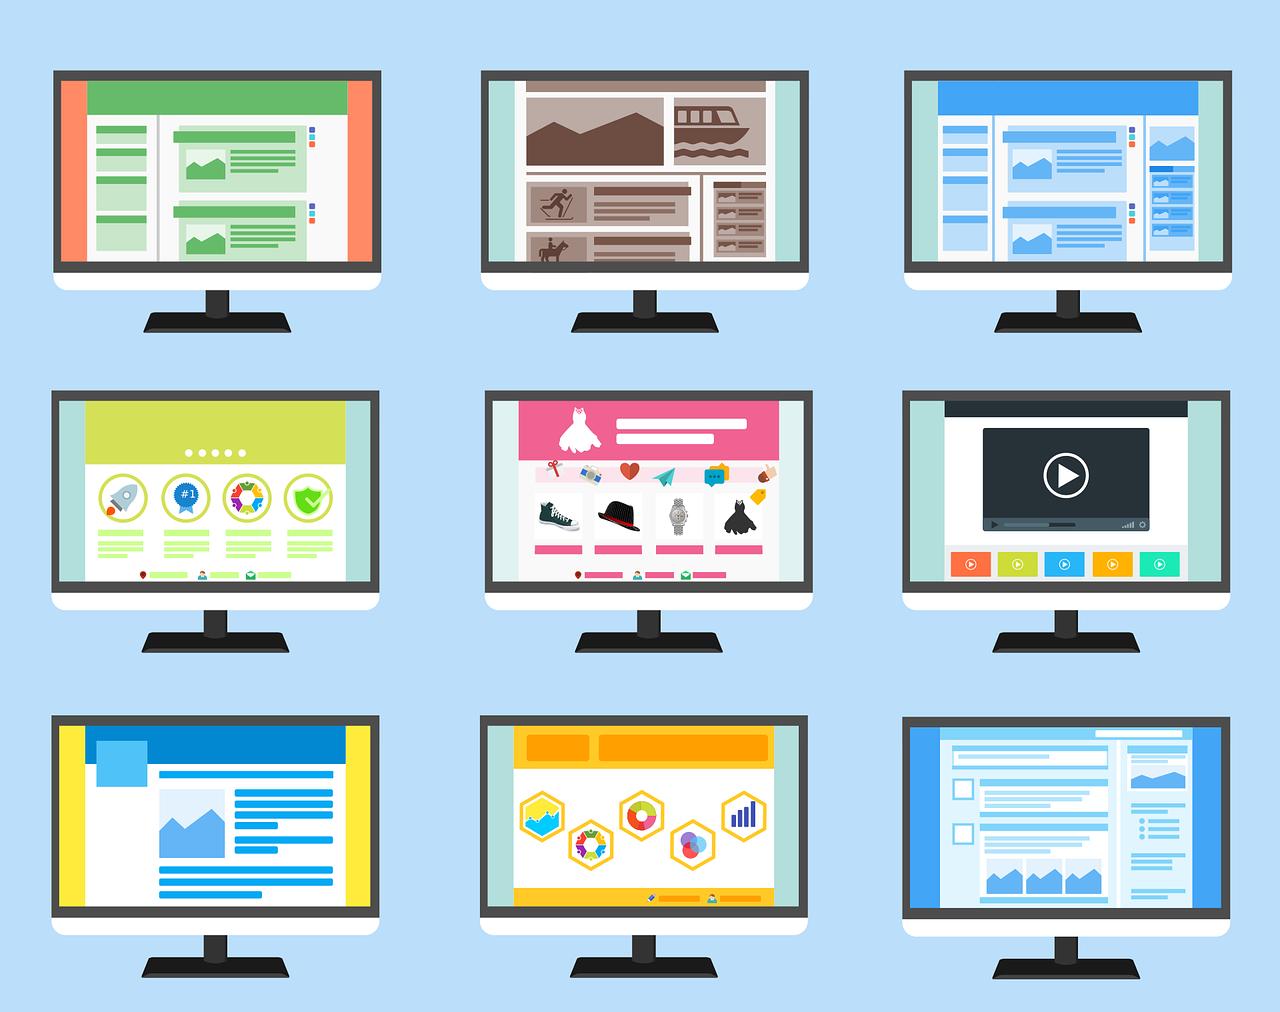 Website building tips illustration